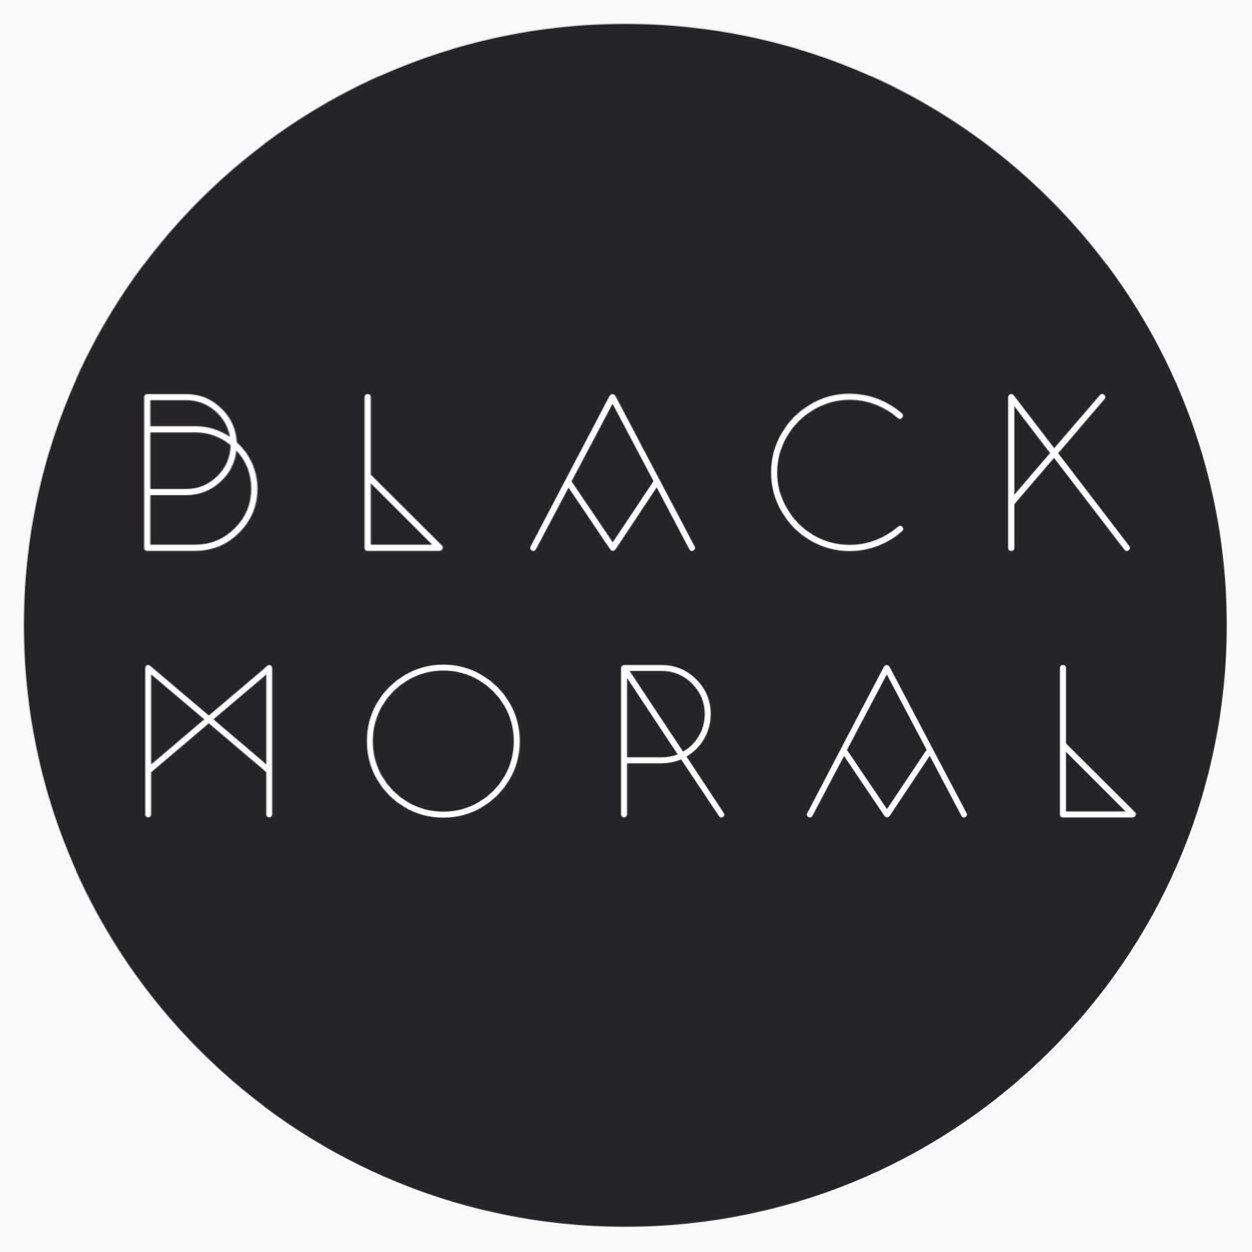 R O C K: B L A C K M O R A L (@BLACKMORAL_UG)